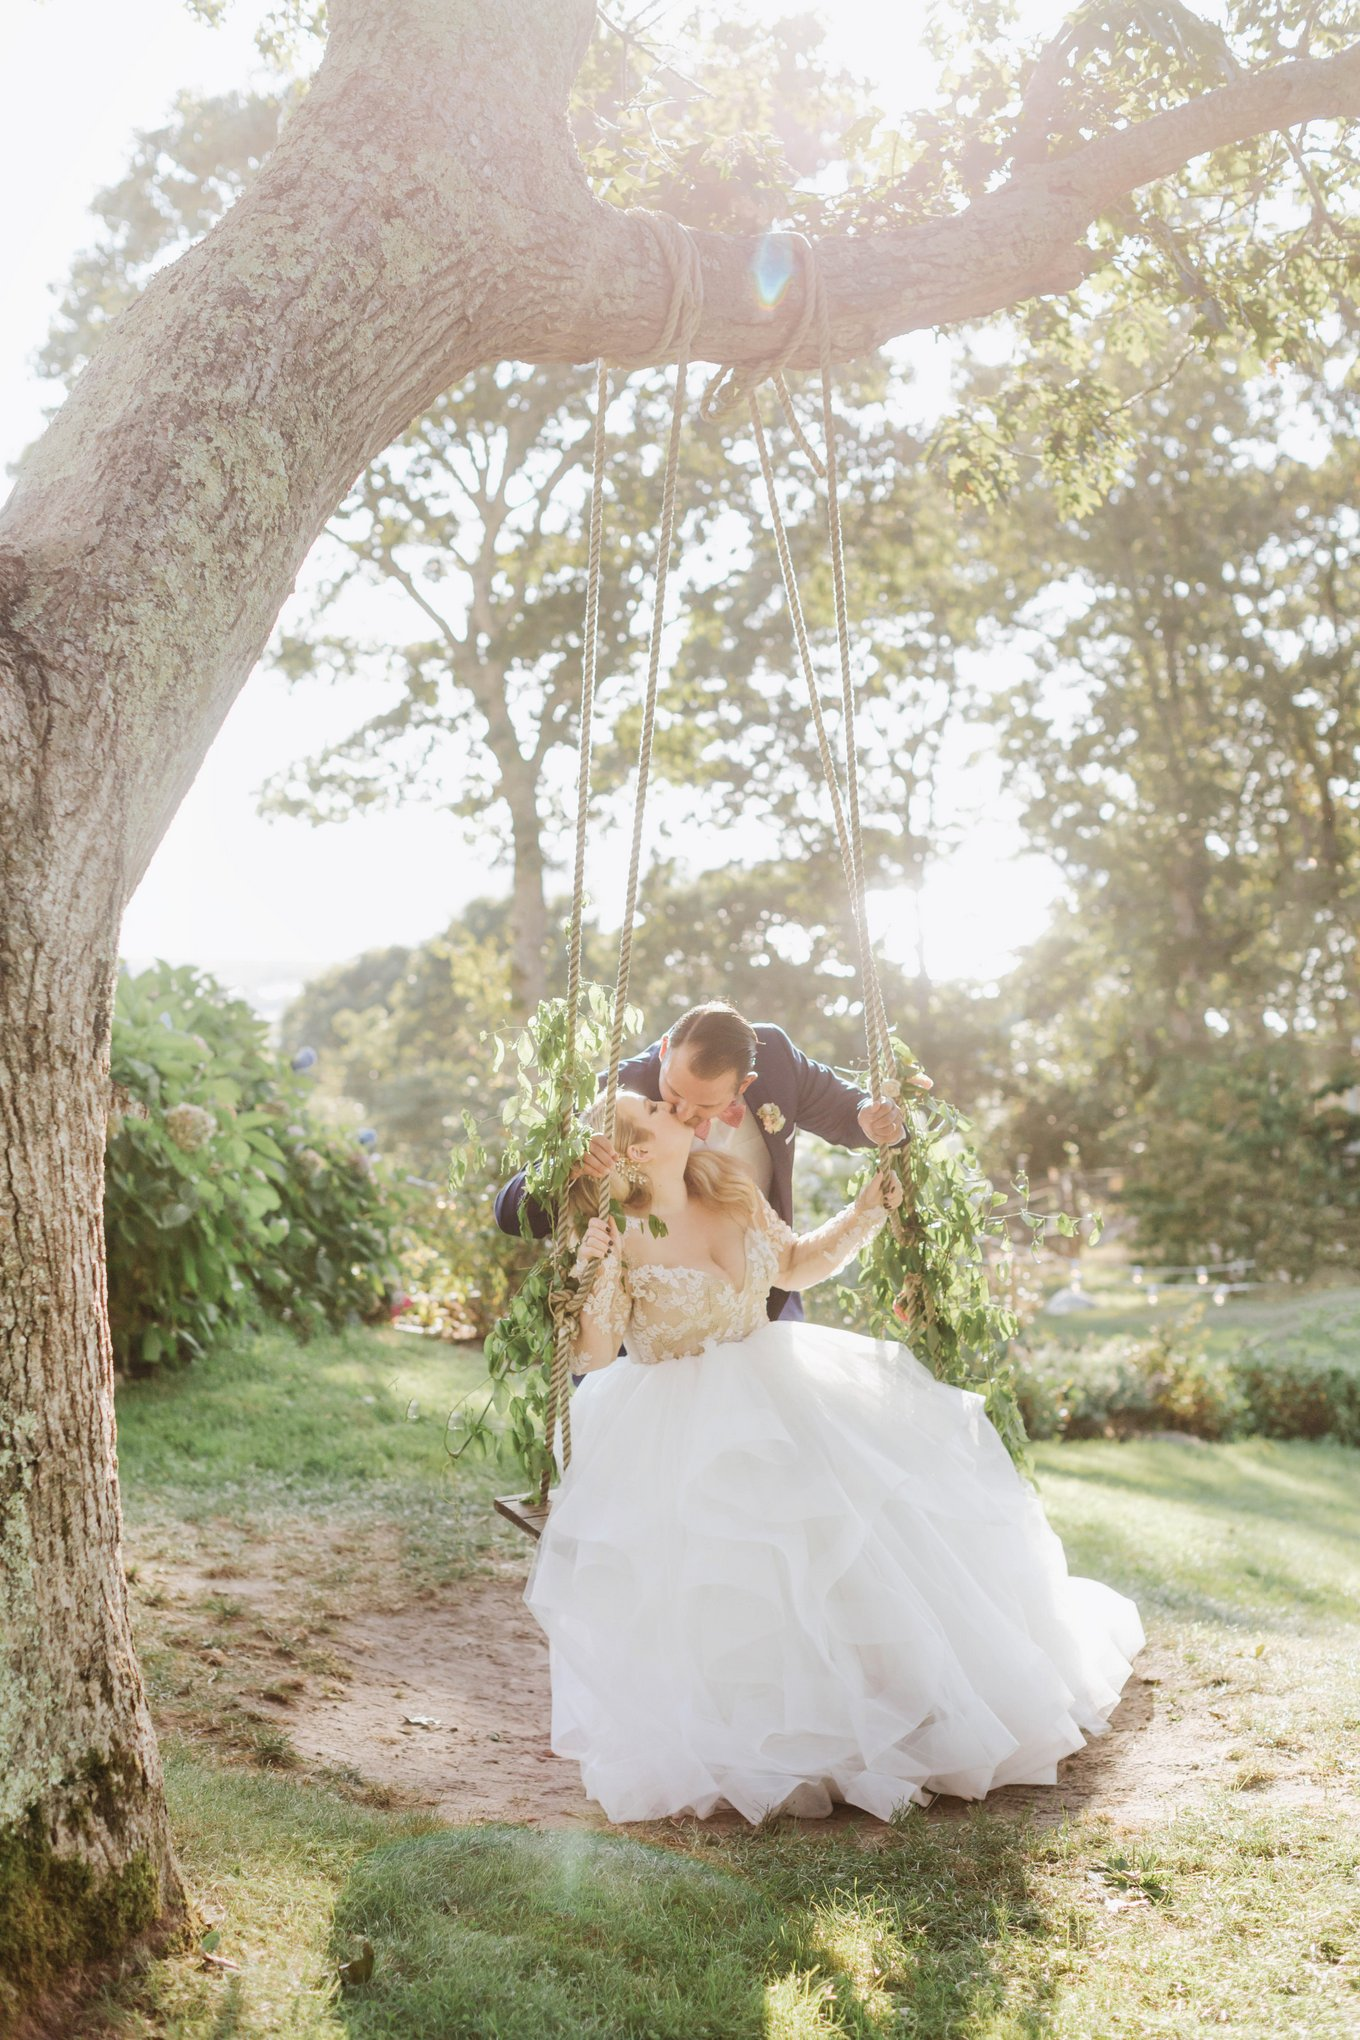 Marthas-Vineyard-Wedding-Photographer-Beach-Plum-Inn-39.jpg